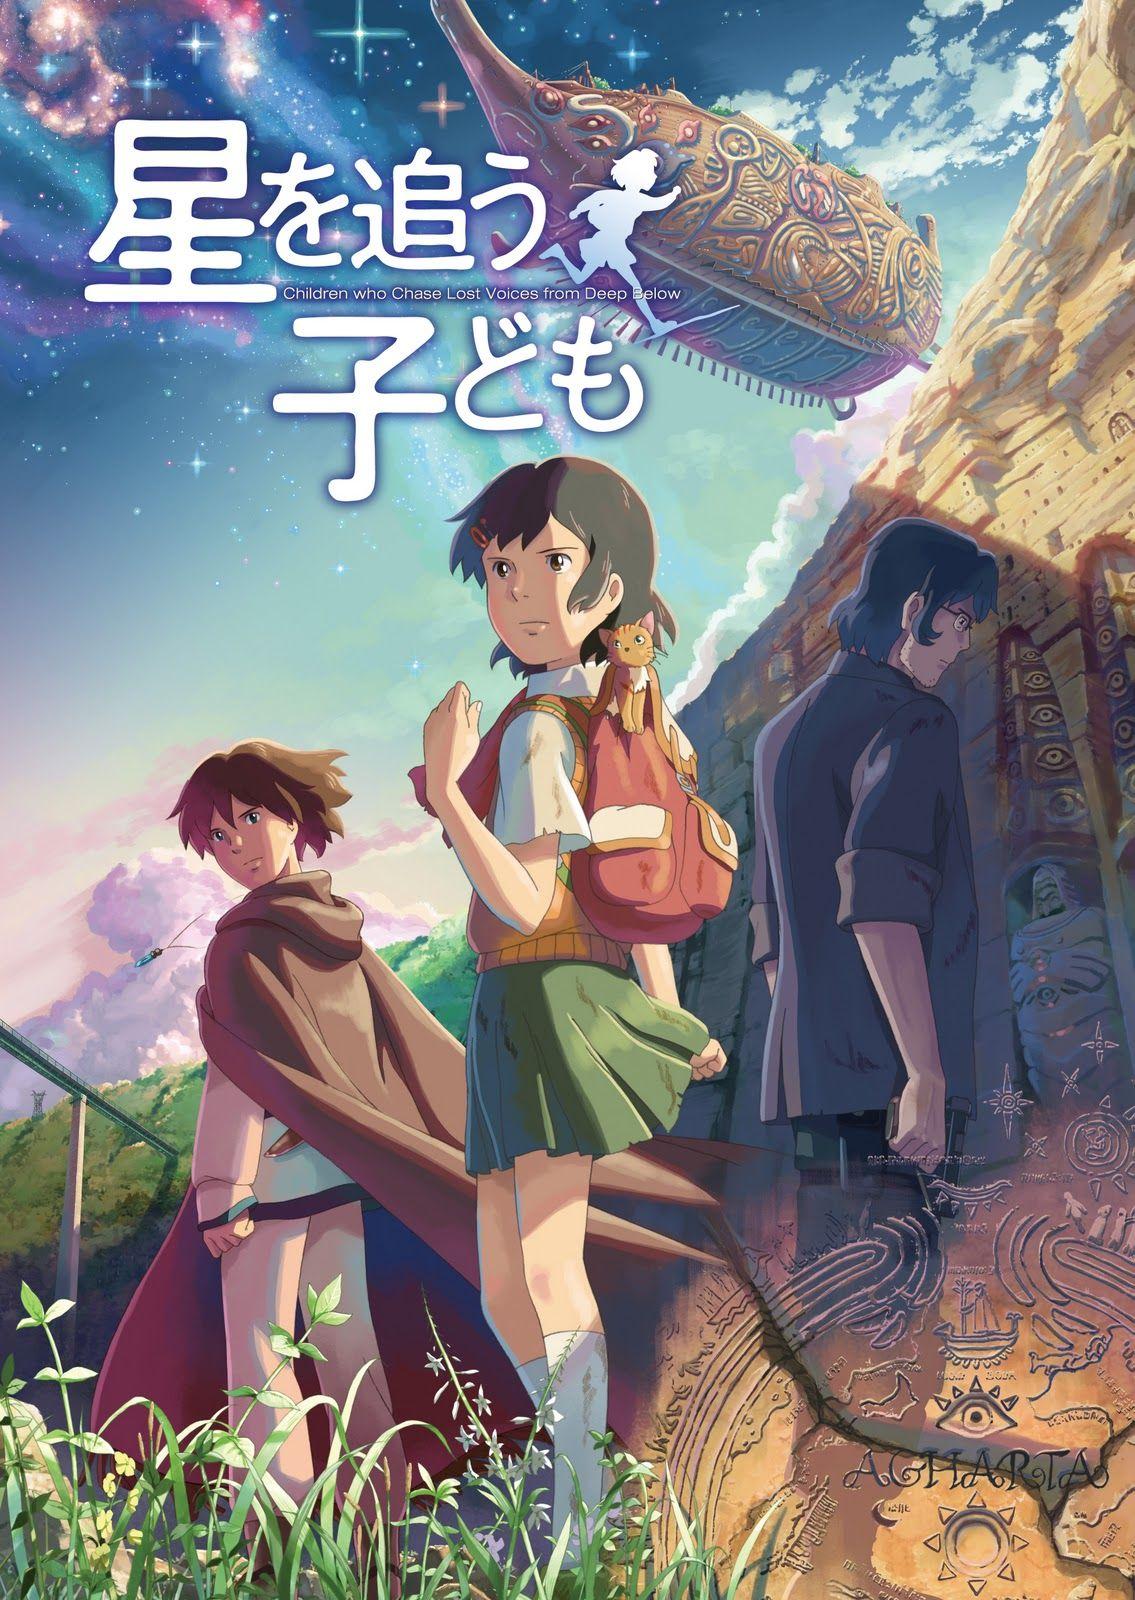 Hoshi Wo Ou Kodomo Genres Adventure Fantasy Romance Filmes De Anime Anime Anime Meninas